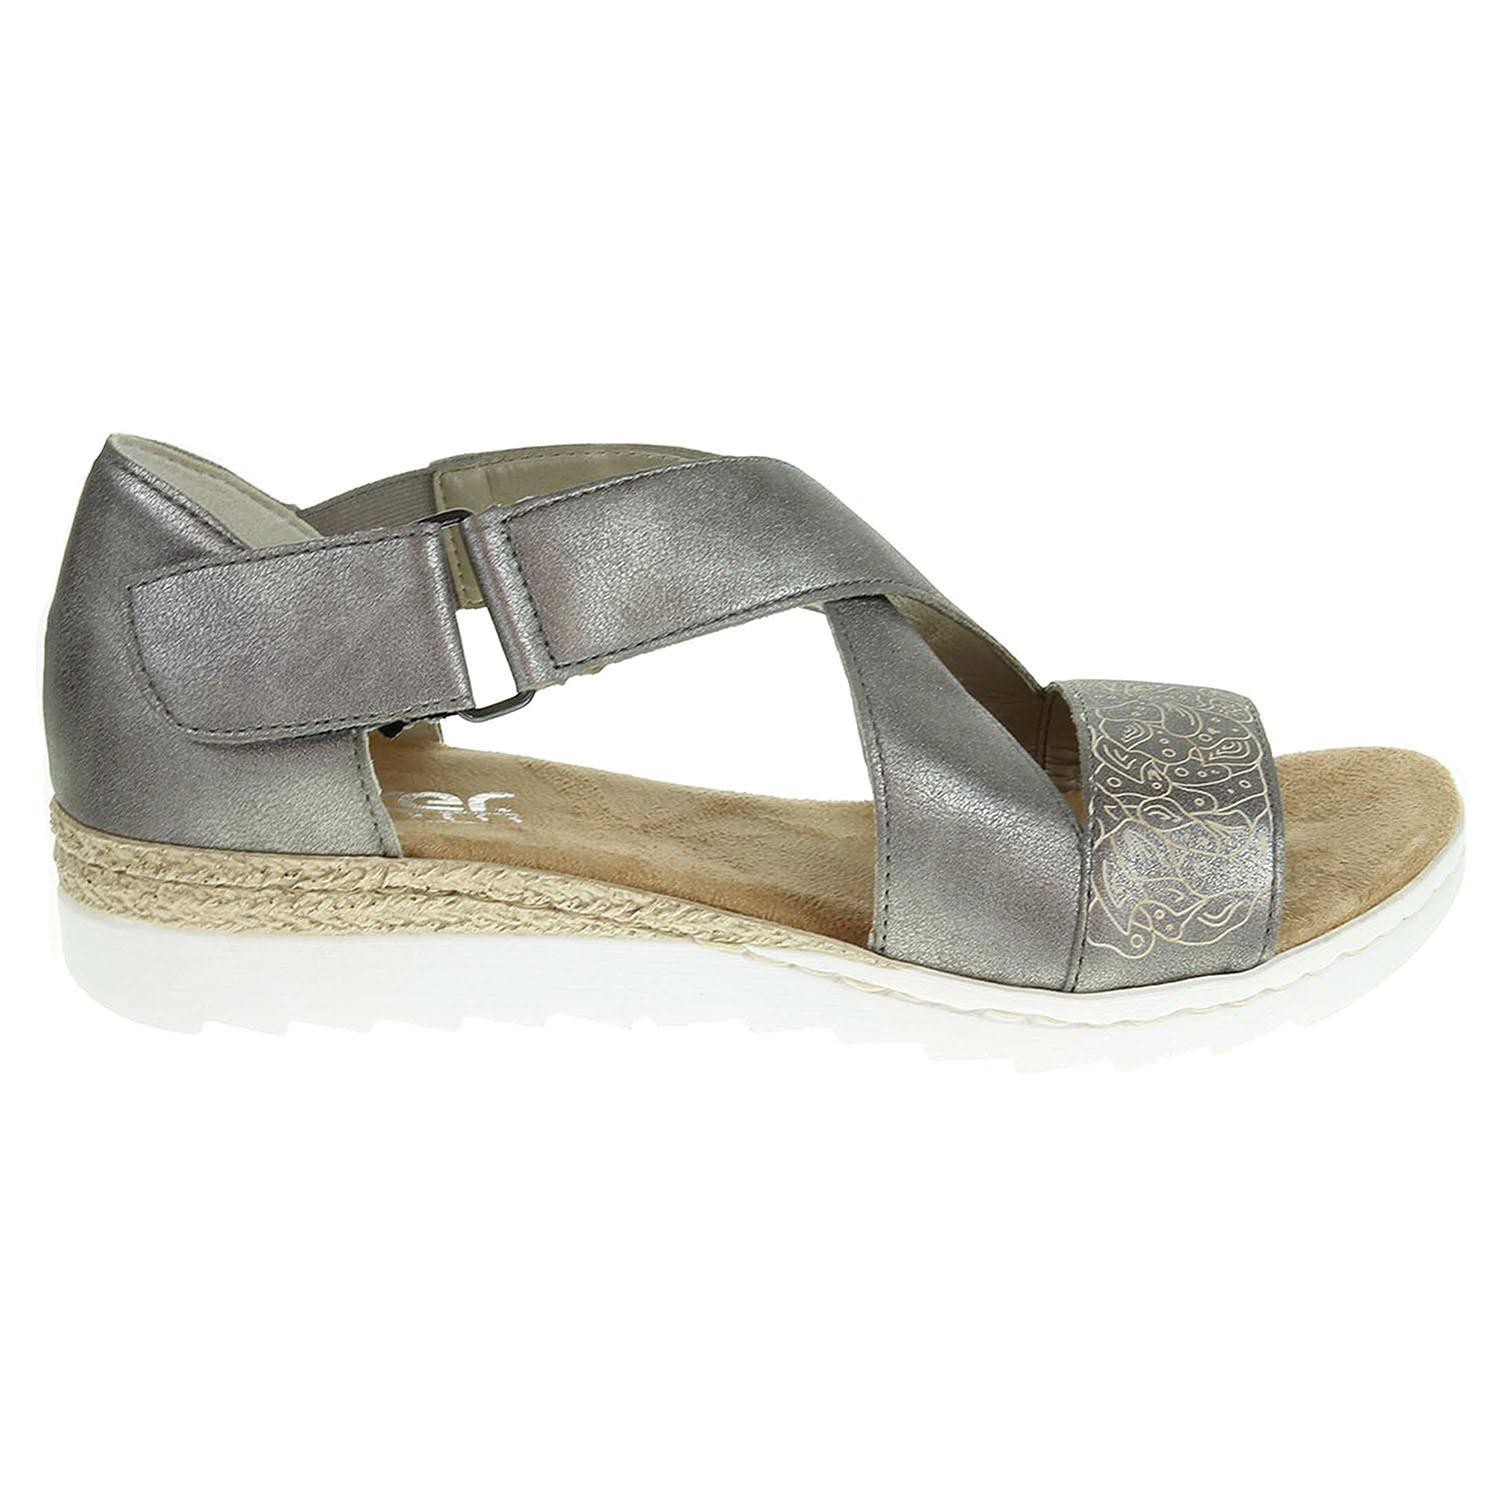 Ecco Rieker dámské sandály 63085-91 stříbrné 23801157